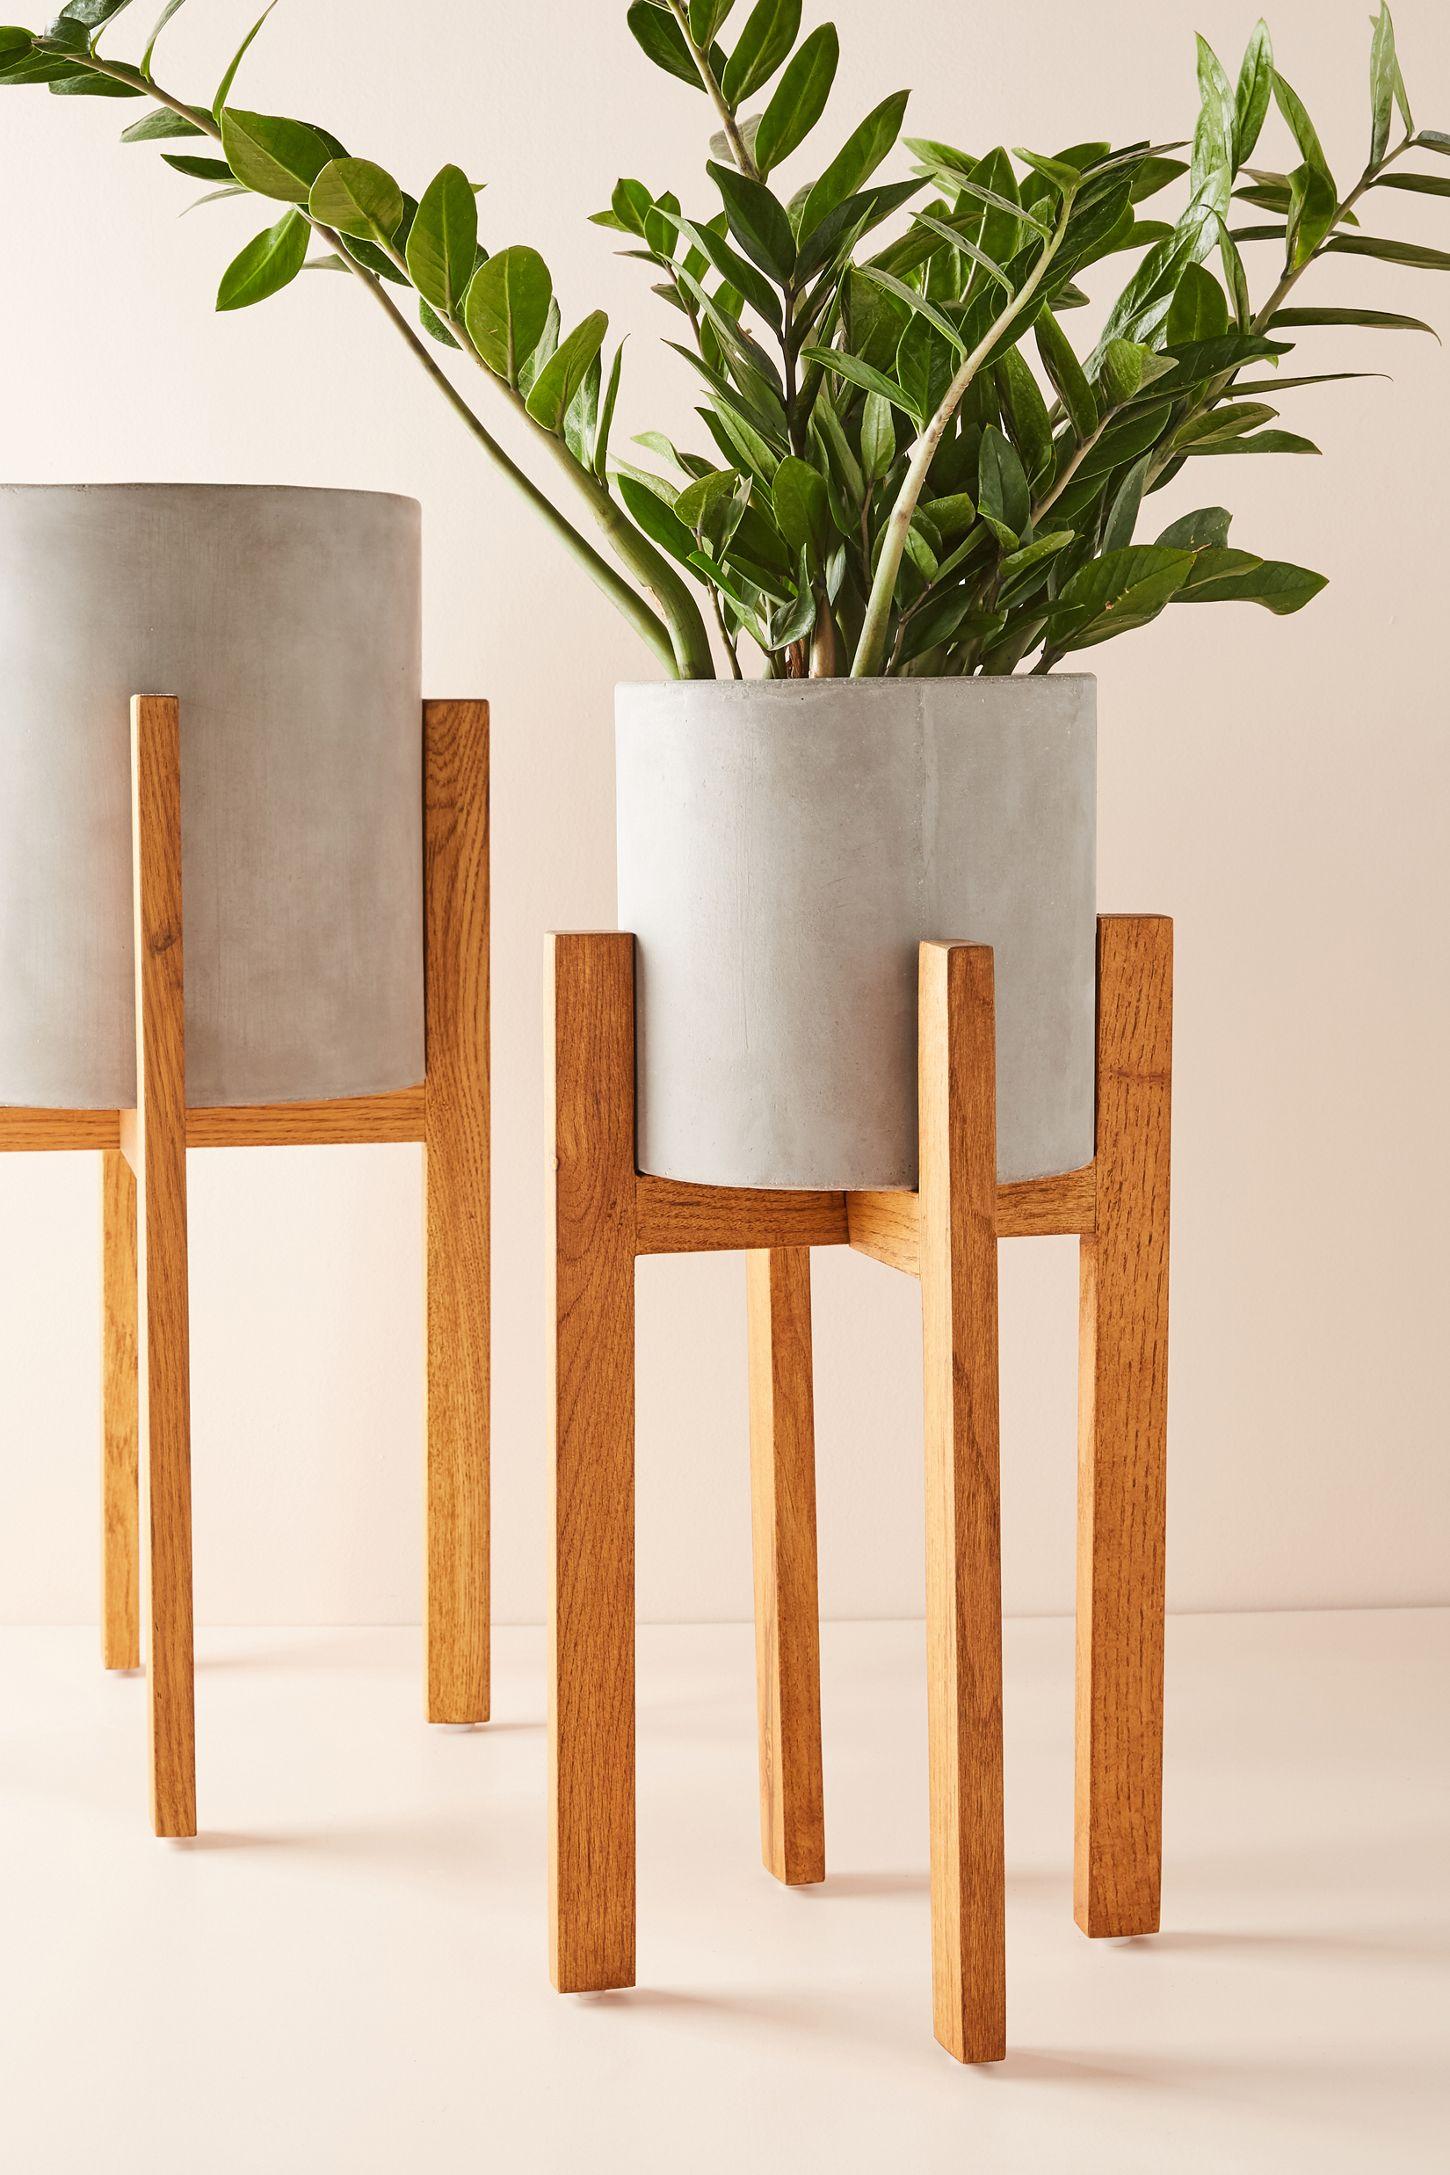 Awe Inspiring Cement Plant Stand Inzonedesignstudio Interior Chair Design Inzonedesignstudiocom